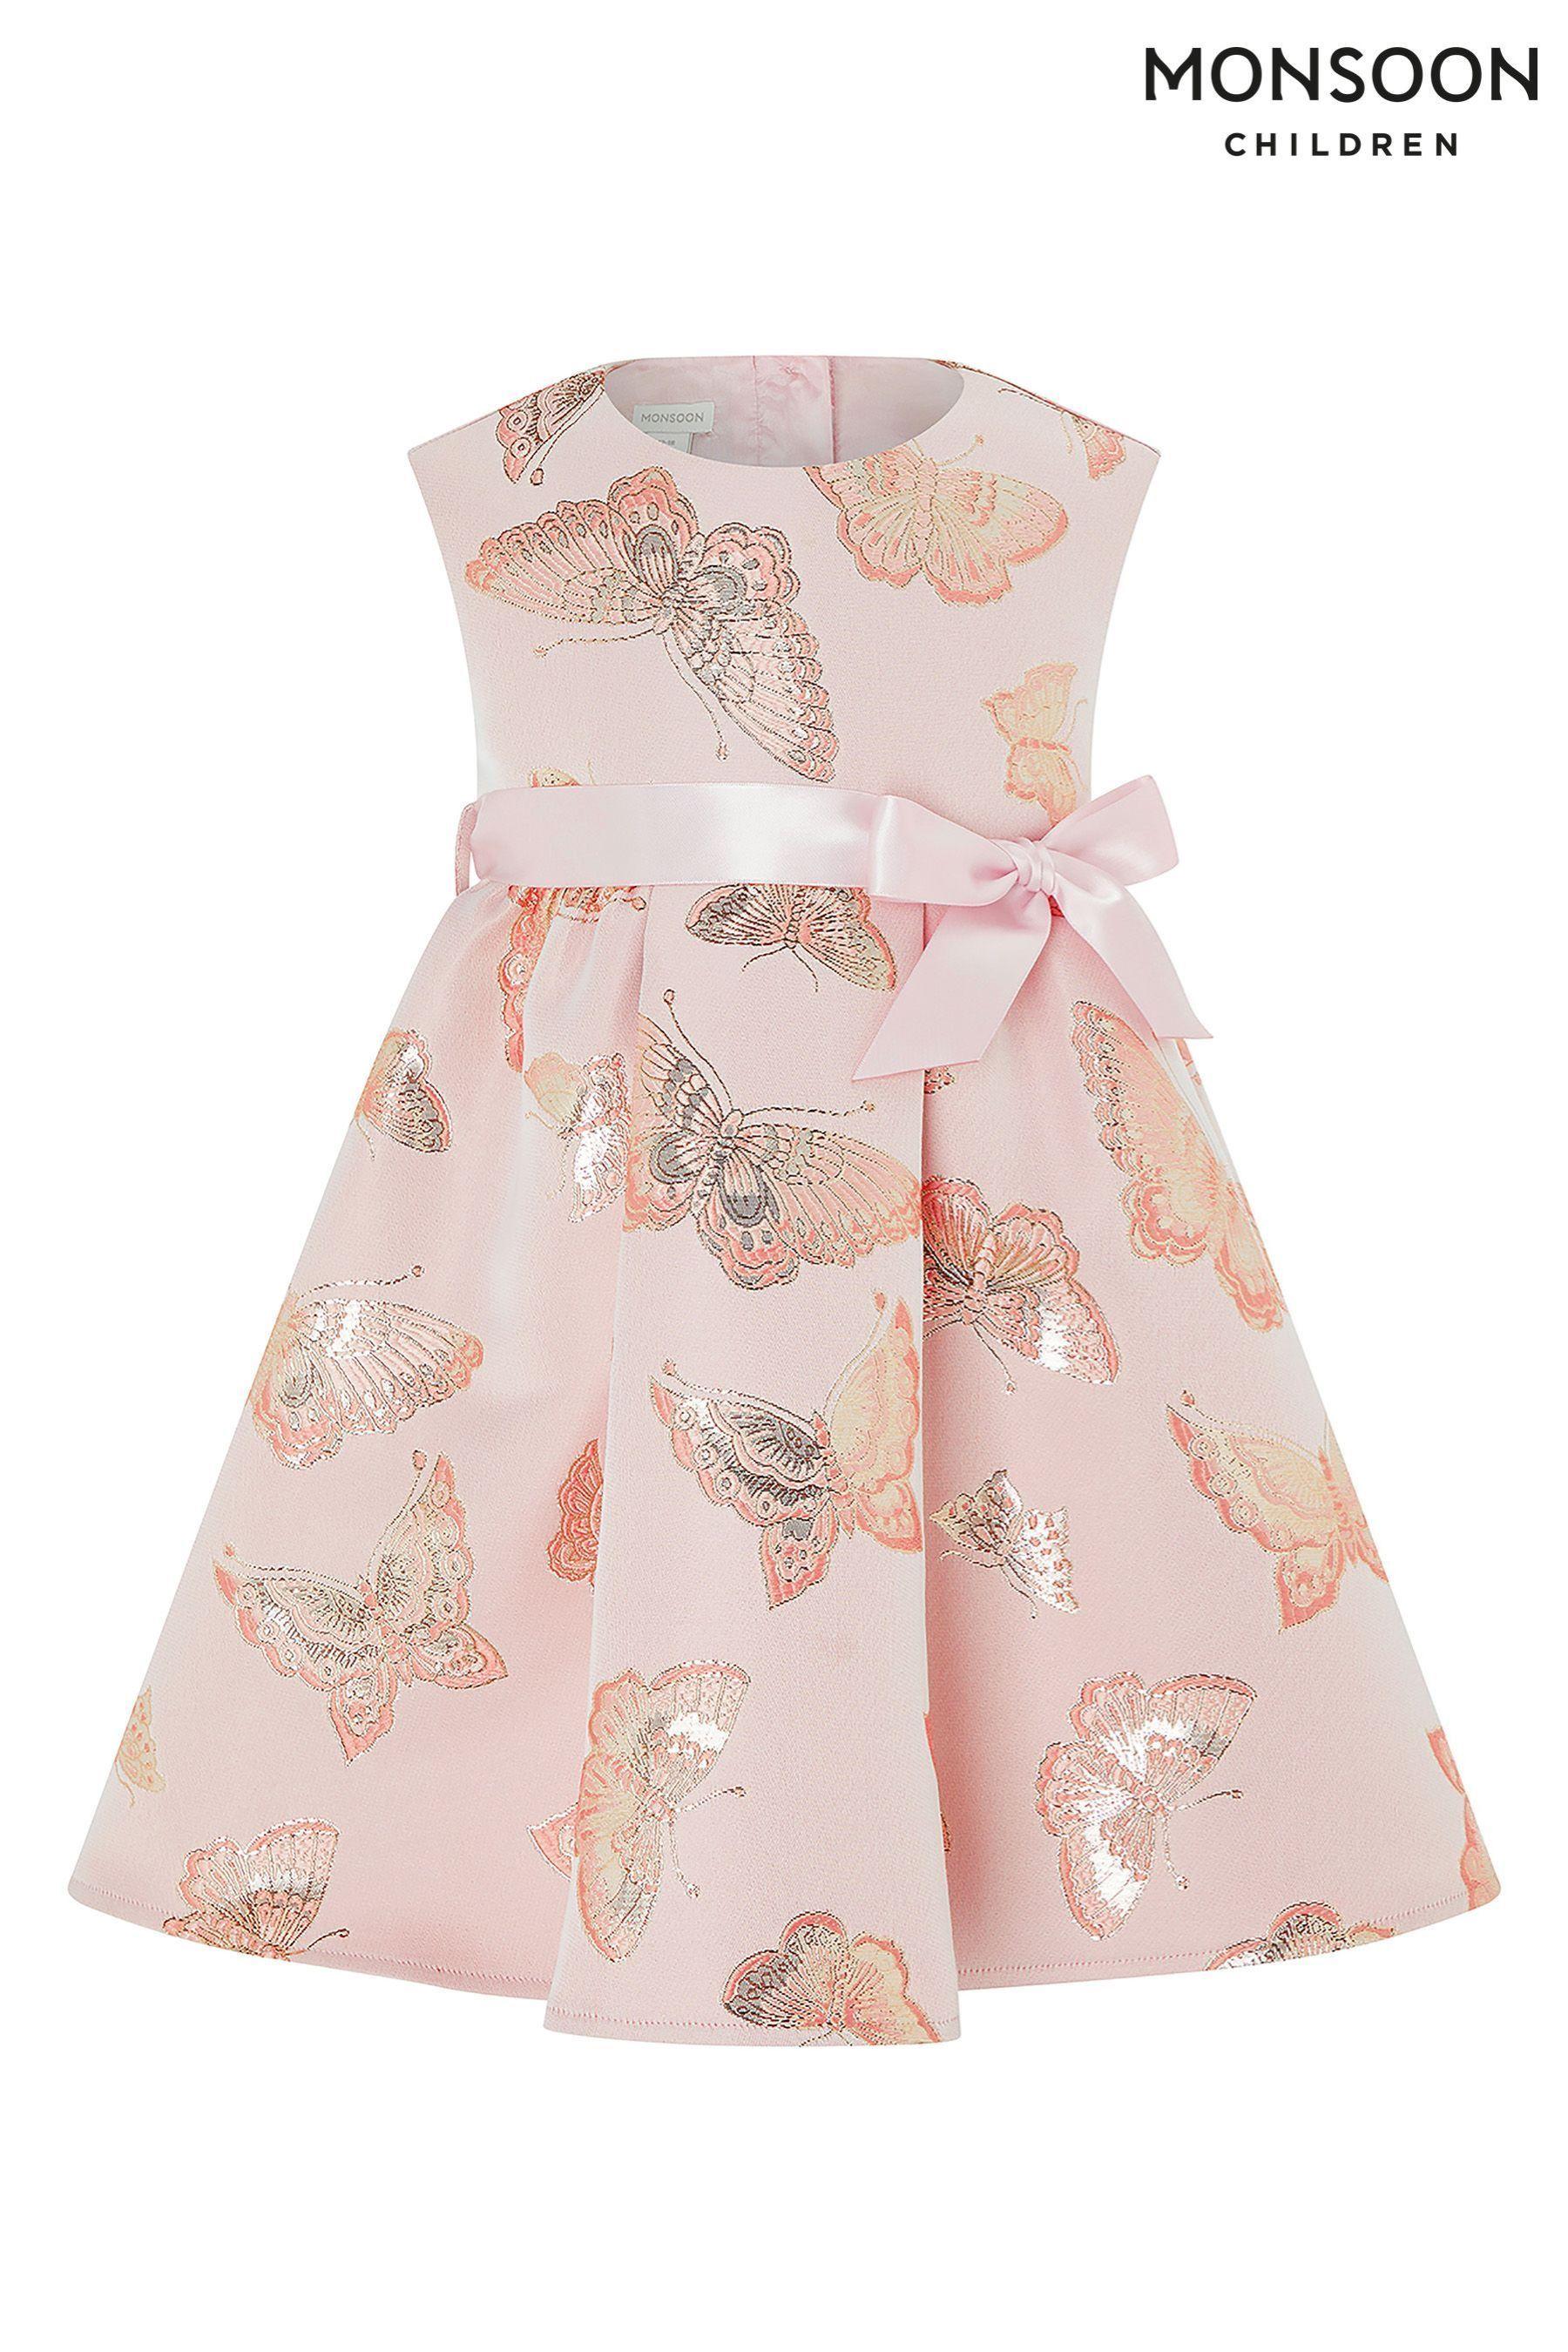 a813b0ce8 Girls Monsoon Pink Baby Nora Butterfly Jacquard Dress - Pink | kids ...